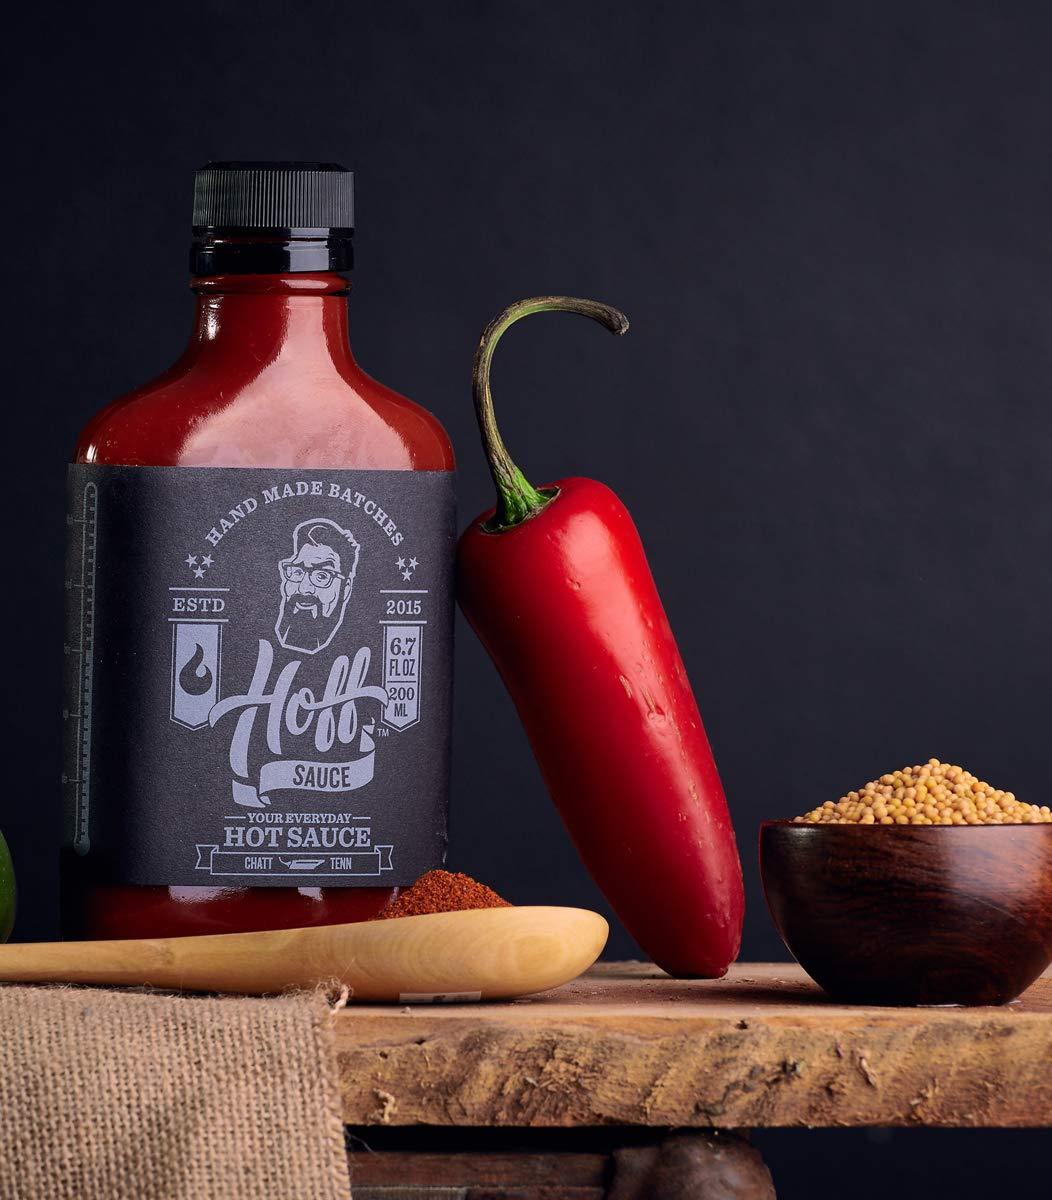 Hoff Sauce - Hoff's Award Winning Louisiana Style Hot Sauce - 6.7oz Flask